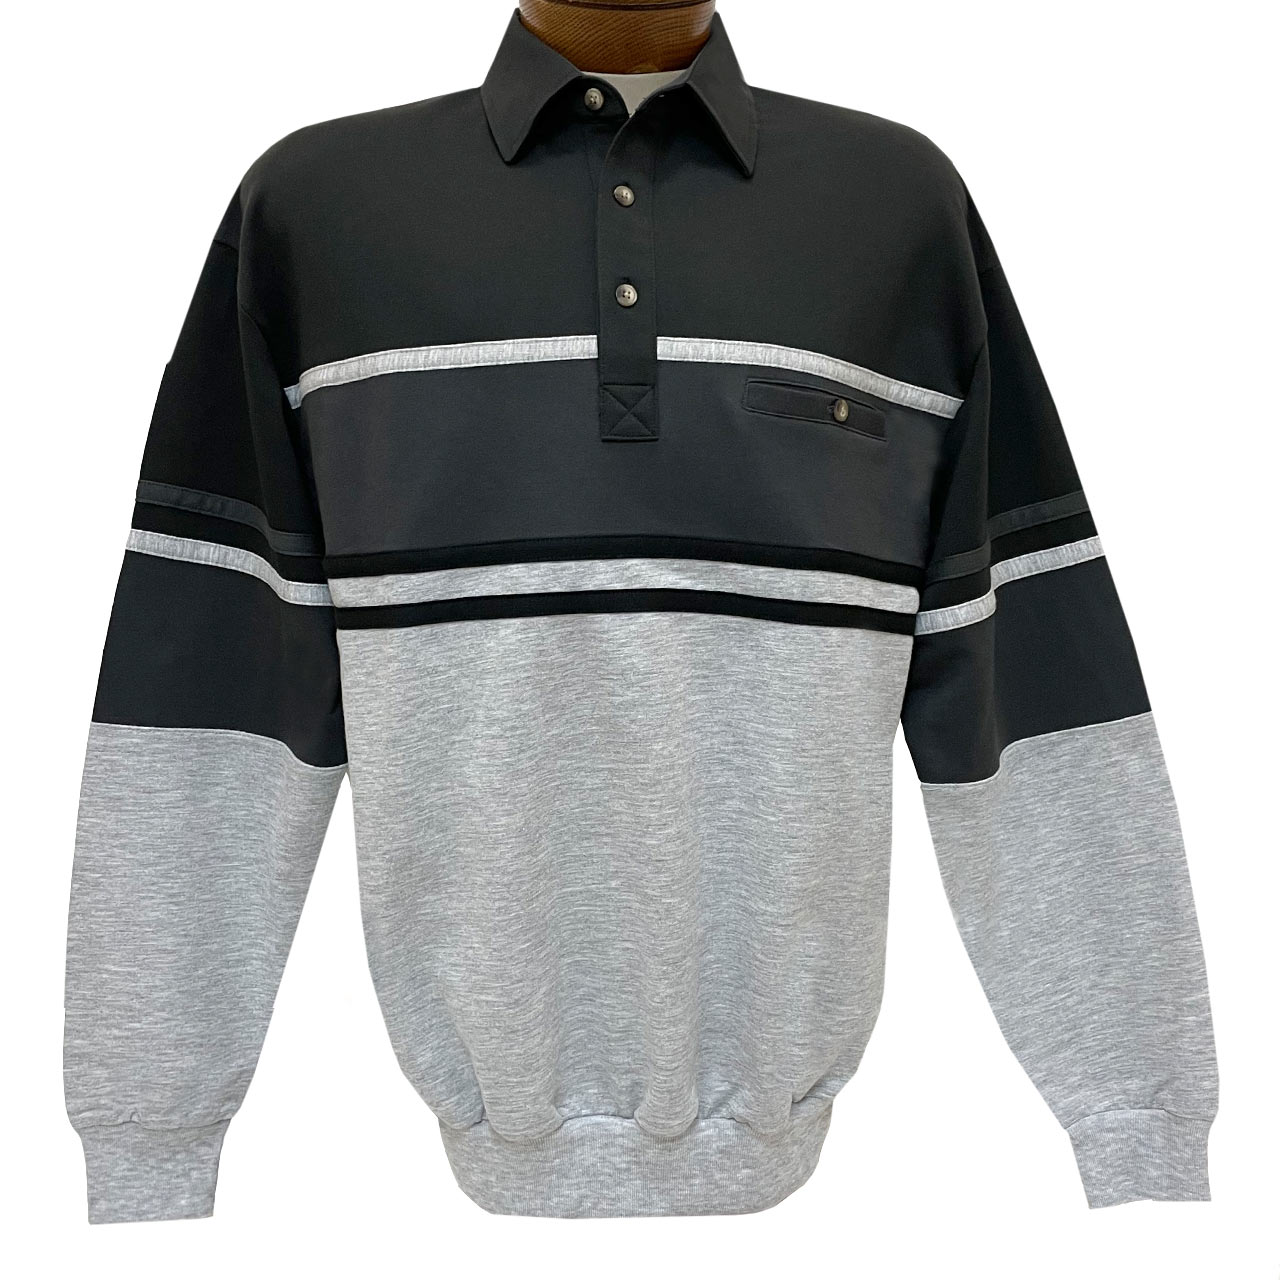 Men's Classics-LD Sport By Palmland Long Sleeve Tailored Collar Horizontal Pieced Banded Bottom Shirt #6094-450 Black